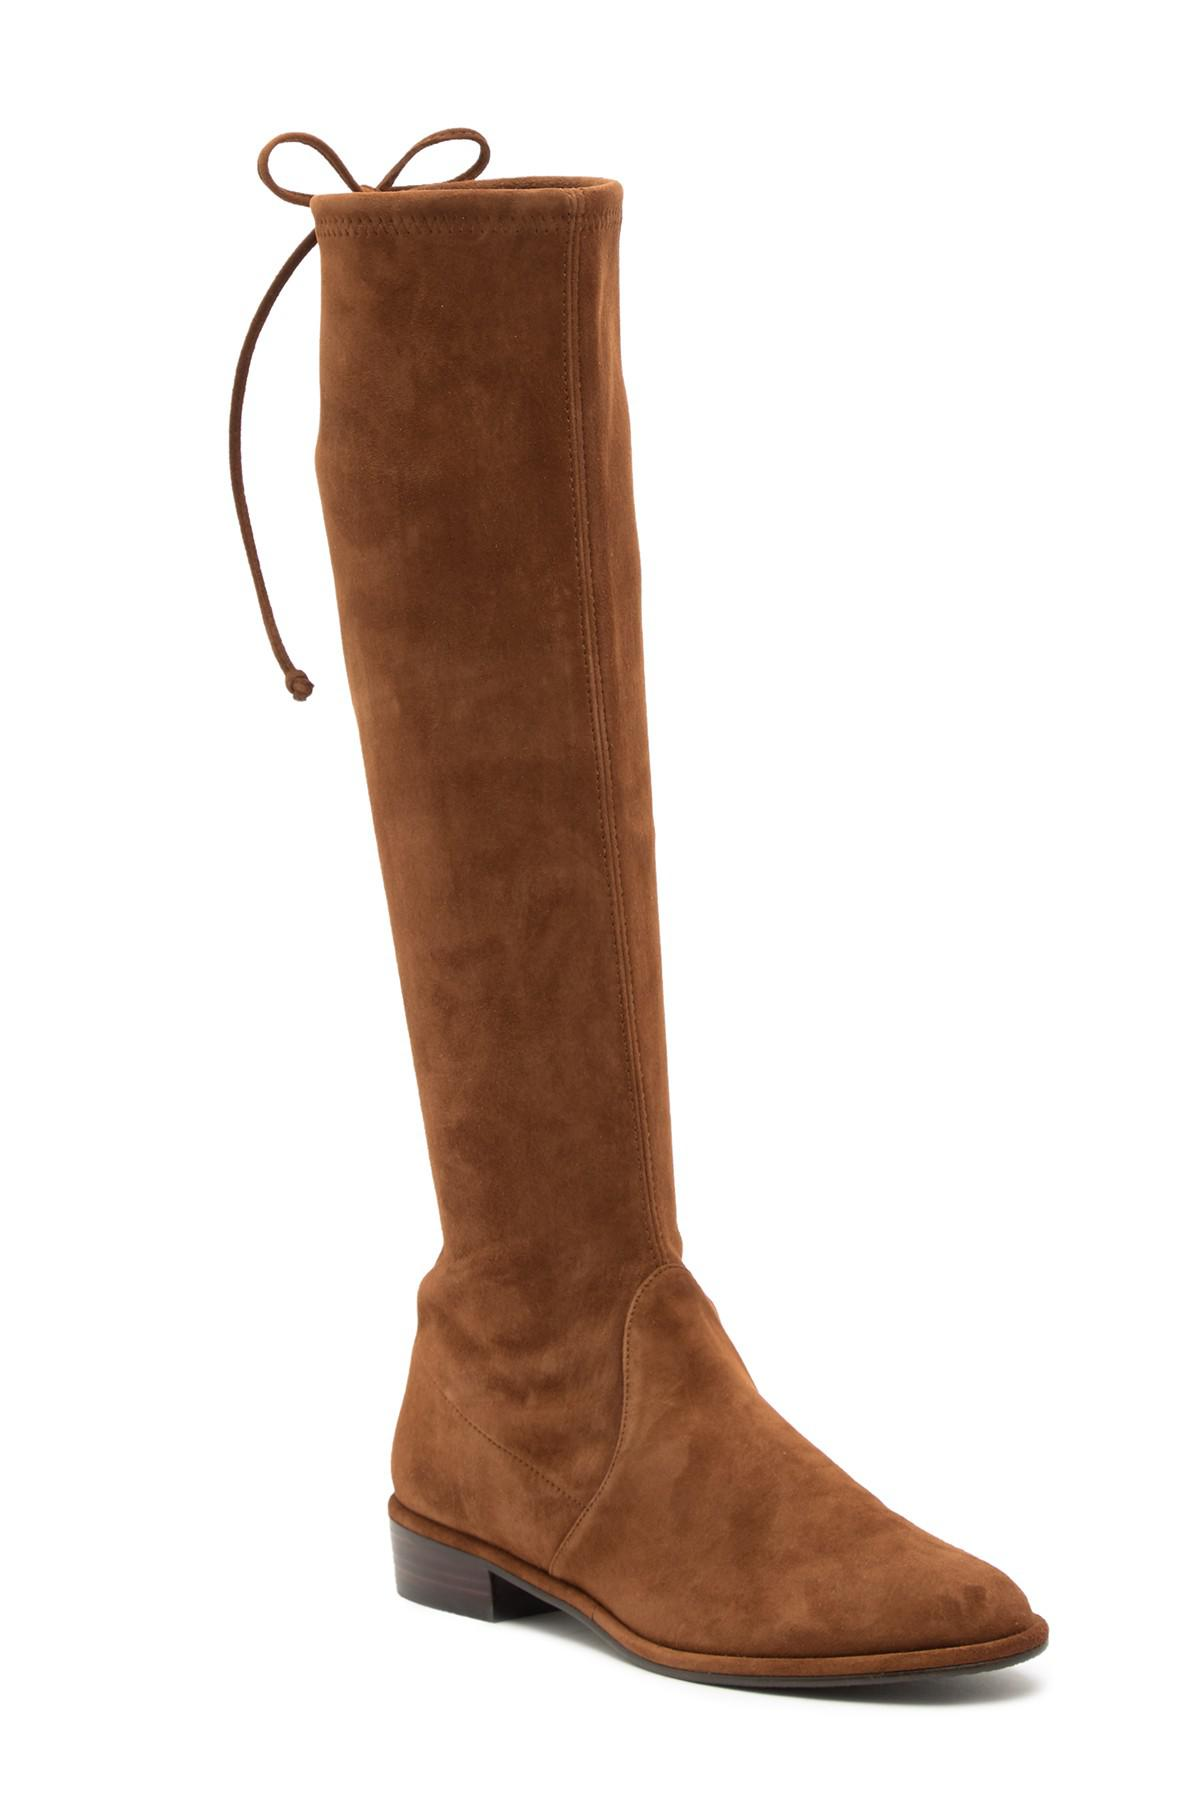 239e7b96677 Lyst - Stuart Weitzman Kneezie Boot in Brown